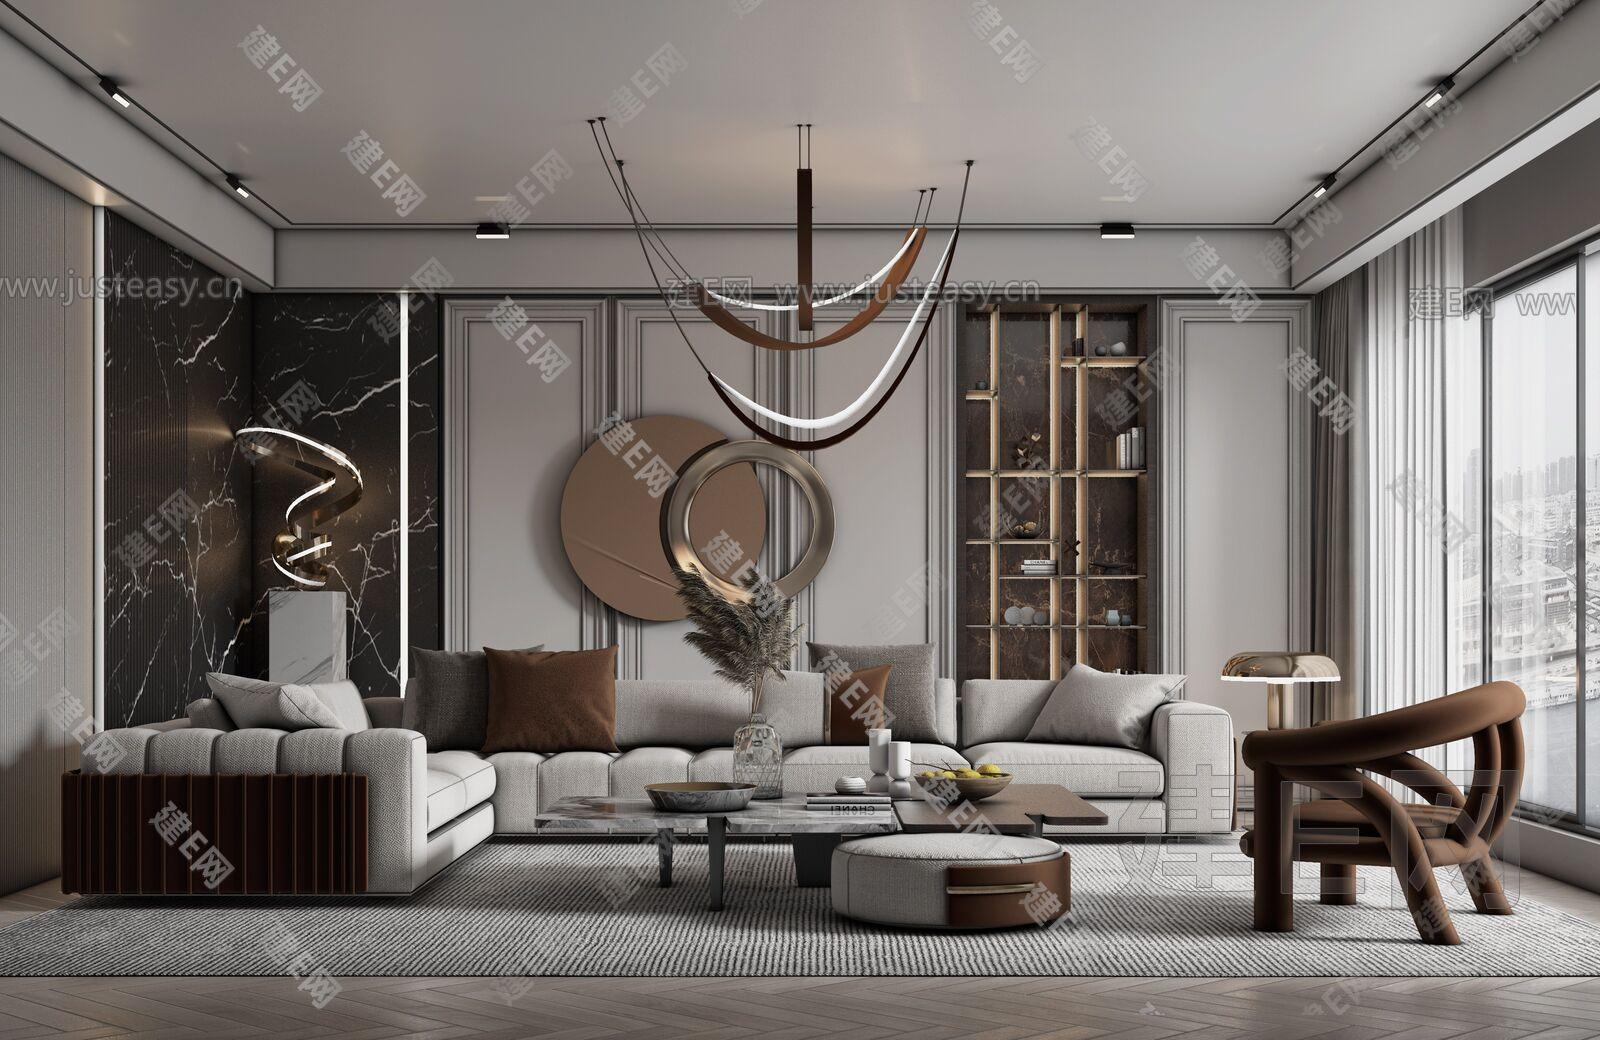 现代轻奢客厅sketchup模型